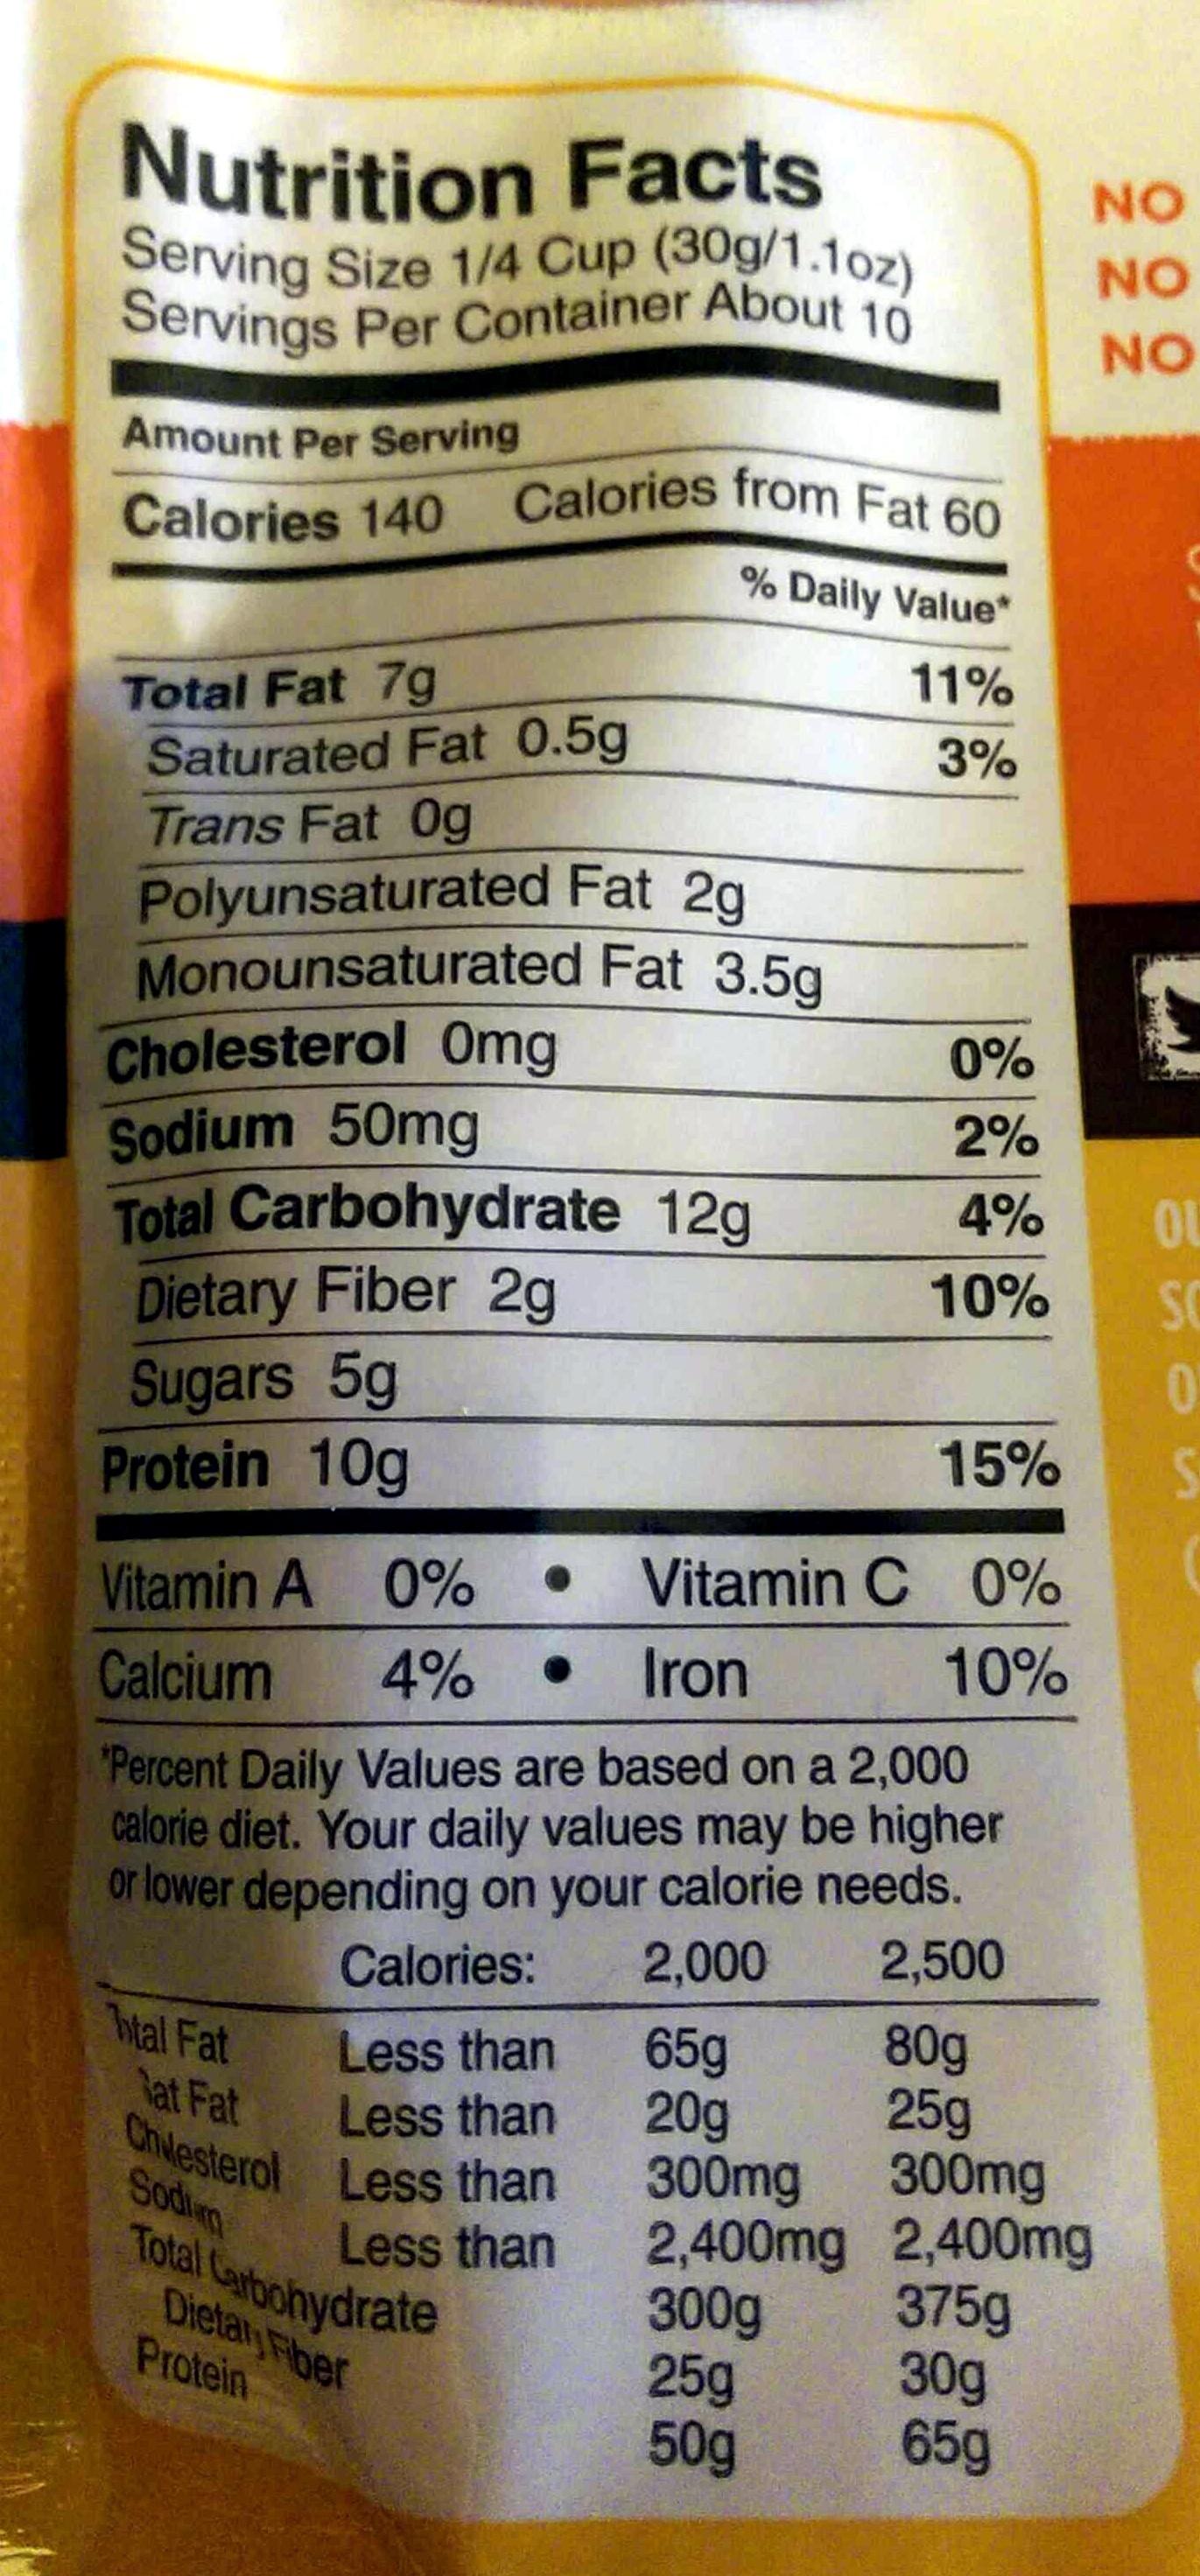 Honey Almond Granola - Nutrition facts